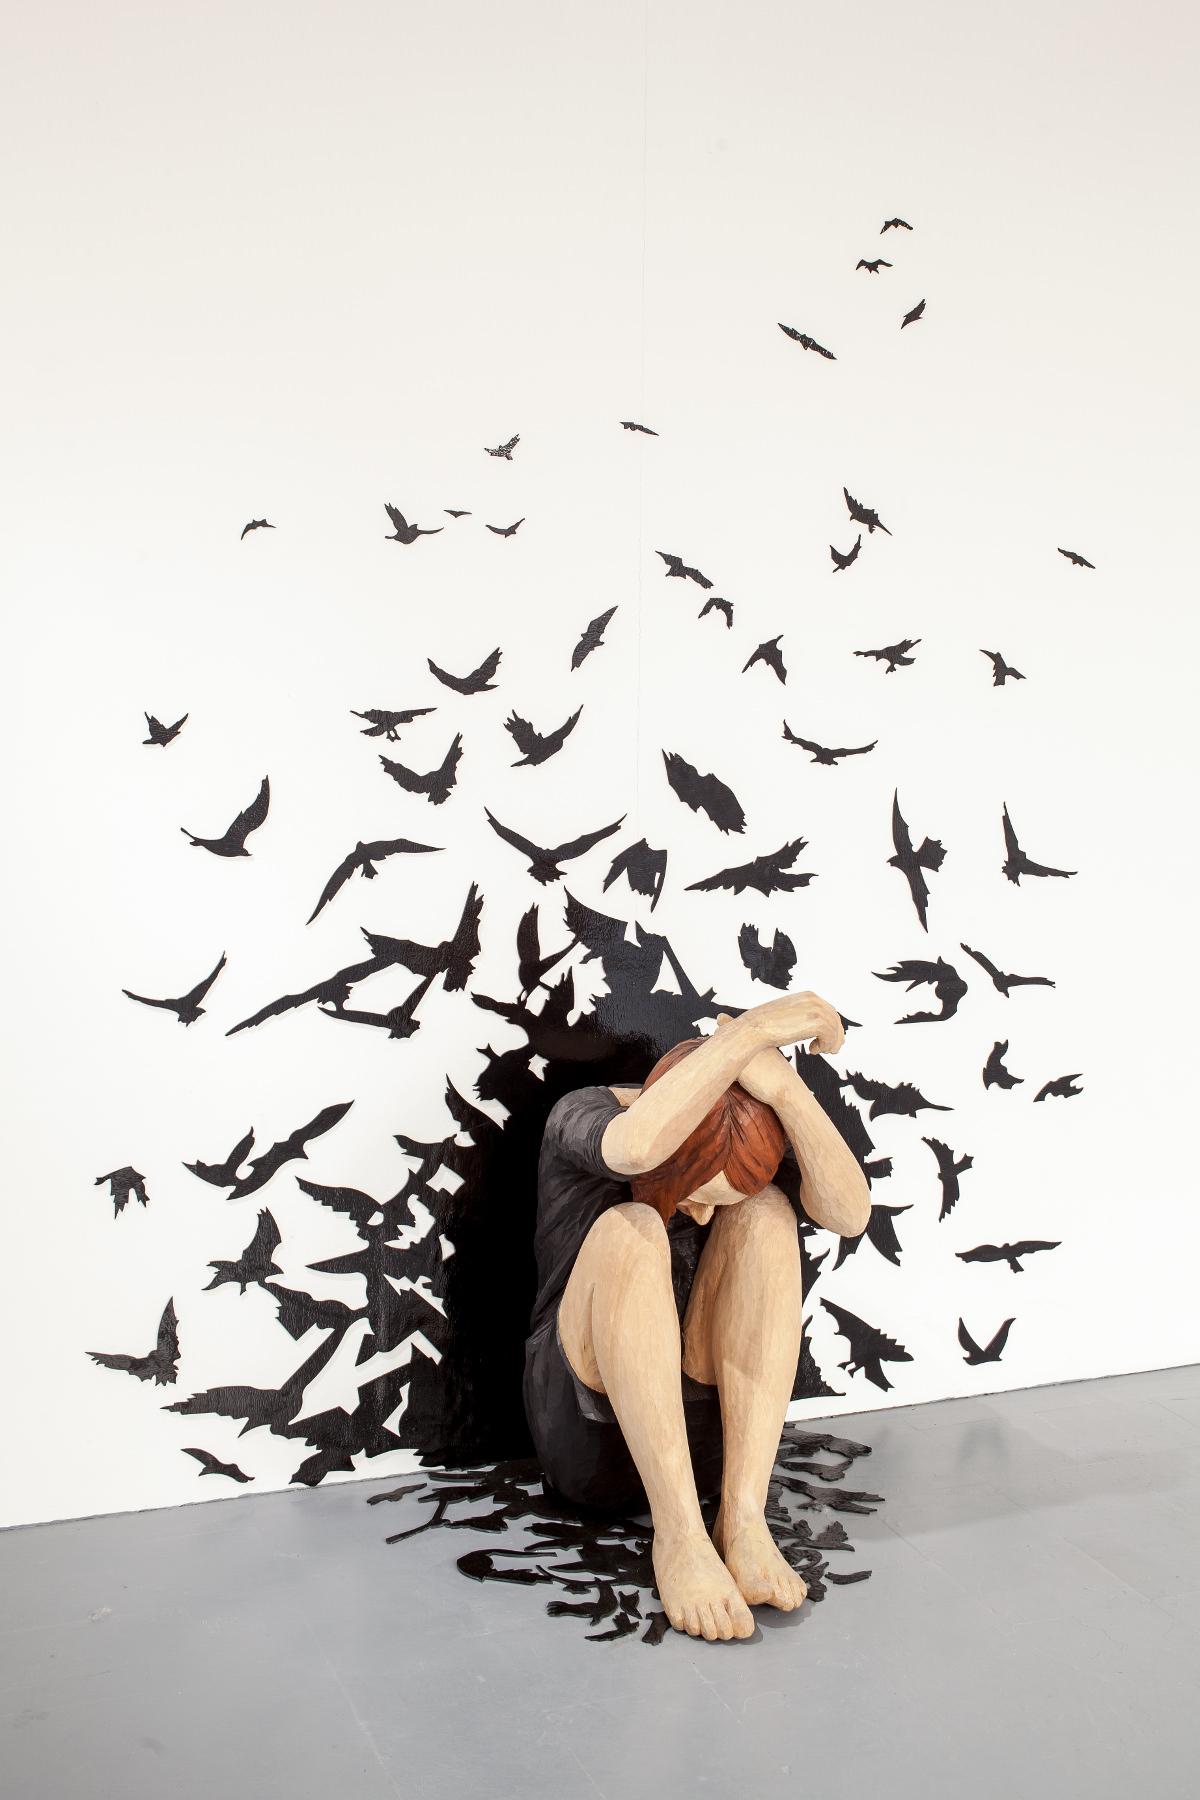 Yasam Sasmazer - Fear of Reason